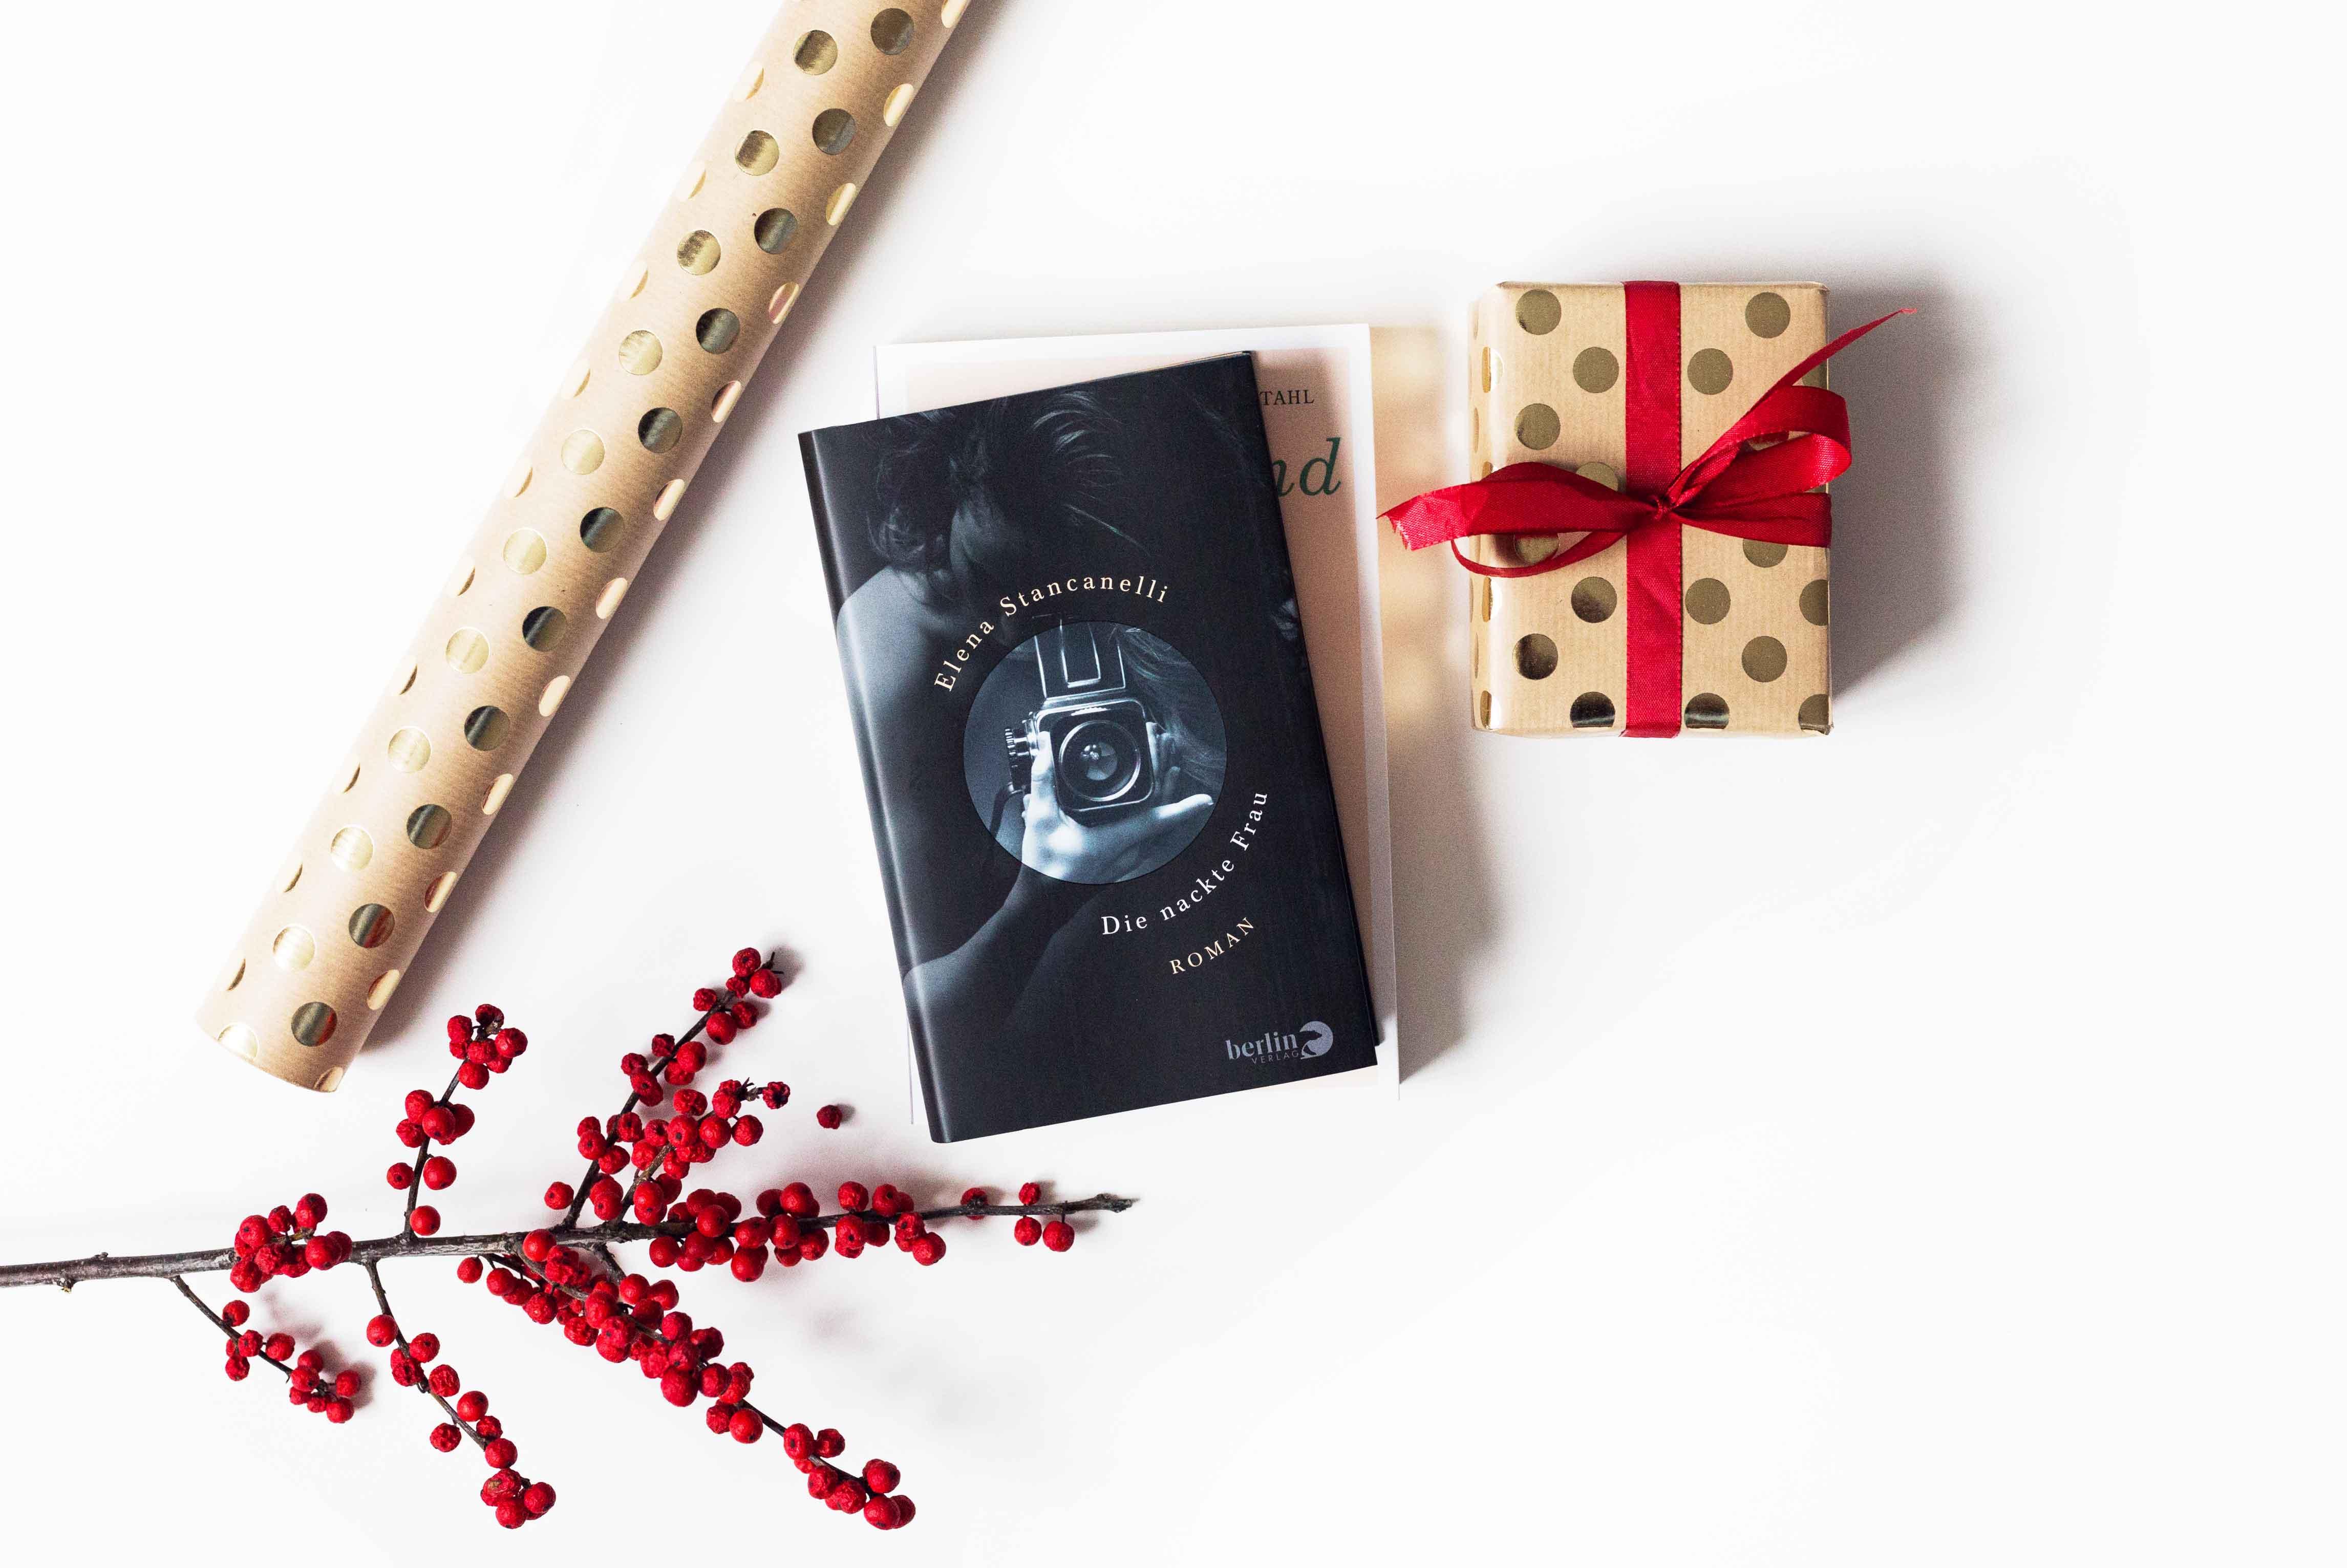 schonhalbelf-buchgeschenke-weihnachten-geschenktipps-buecher-verschenken-geschenkideen-verpacken-literatur-2017